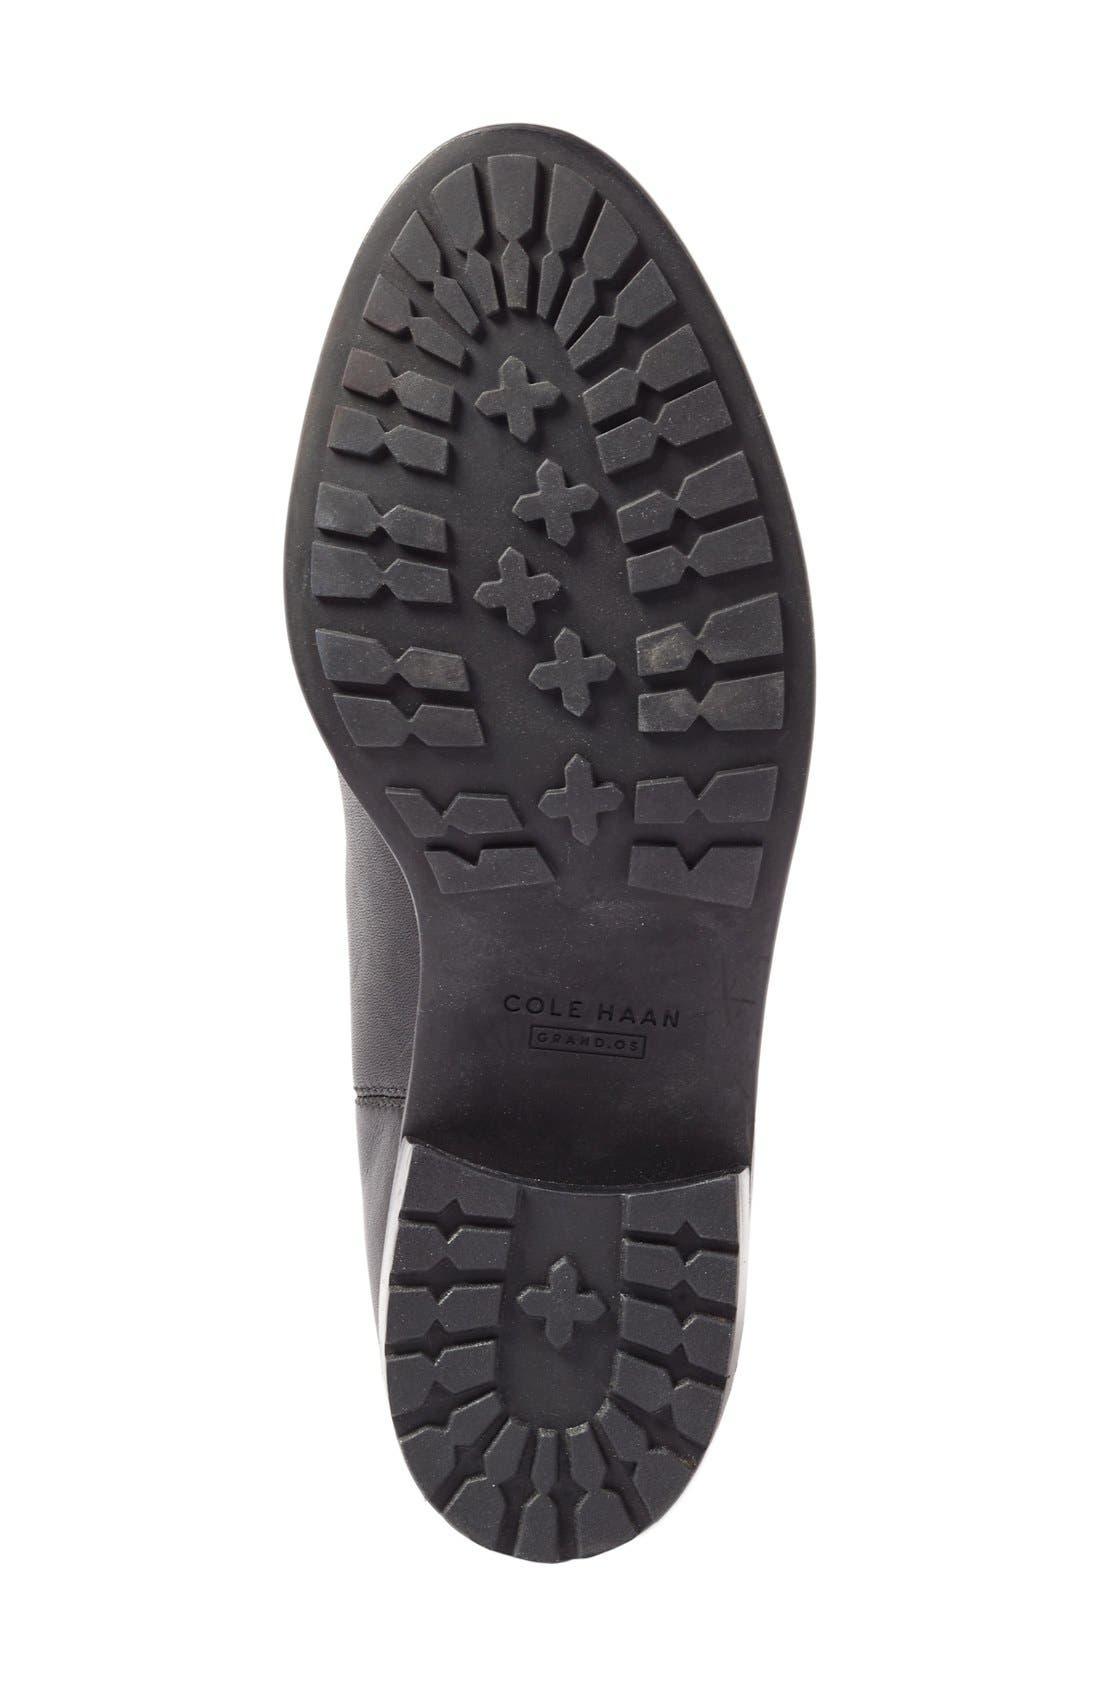 COLE HAAN, Newburg Waterproof Chelsea Boot, Alternate thumbnail 4, color, BLACK LEATHER